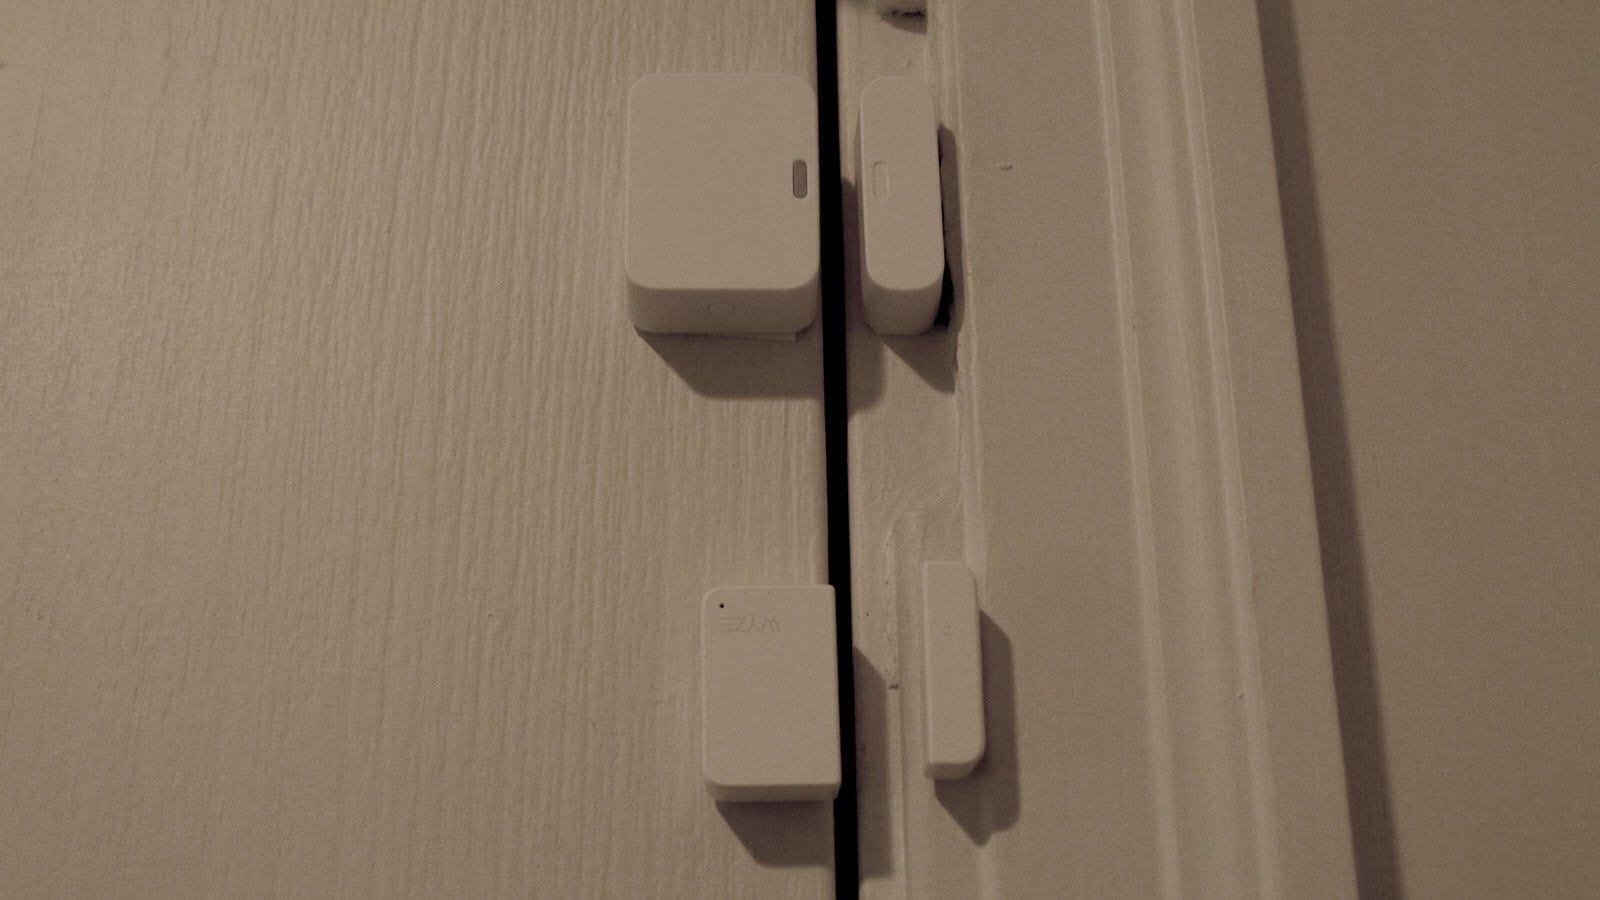 SimpliSafe contact sensor above Wyze Sense contact sense, the latter is about a third smaller.